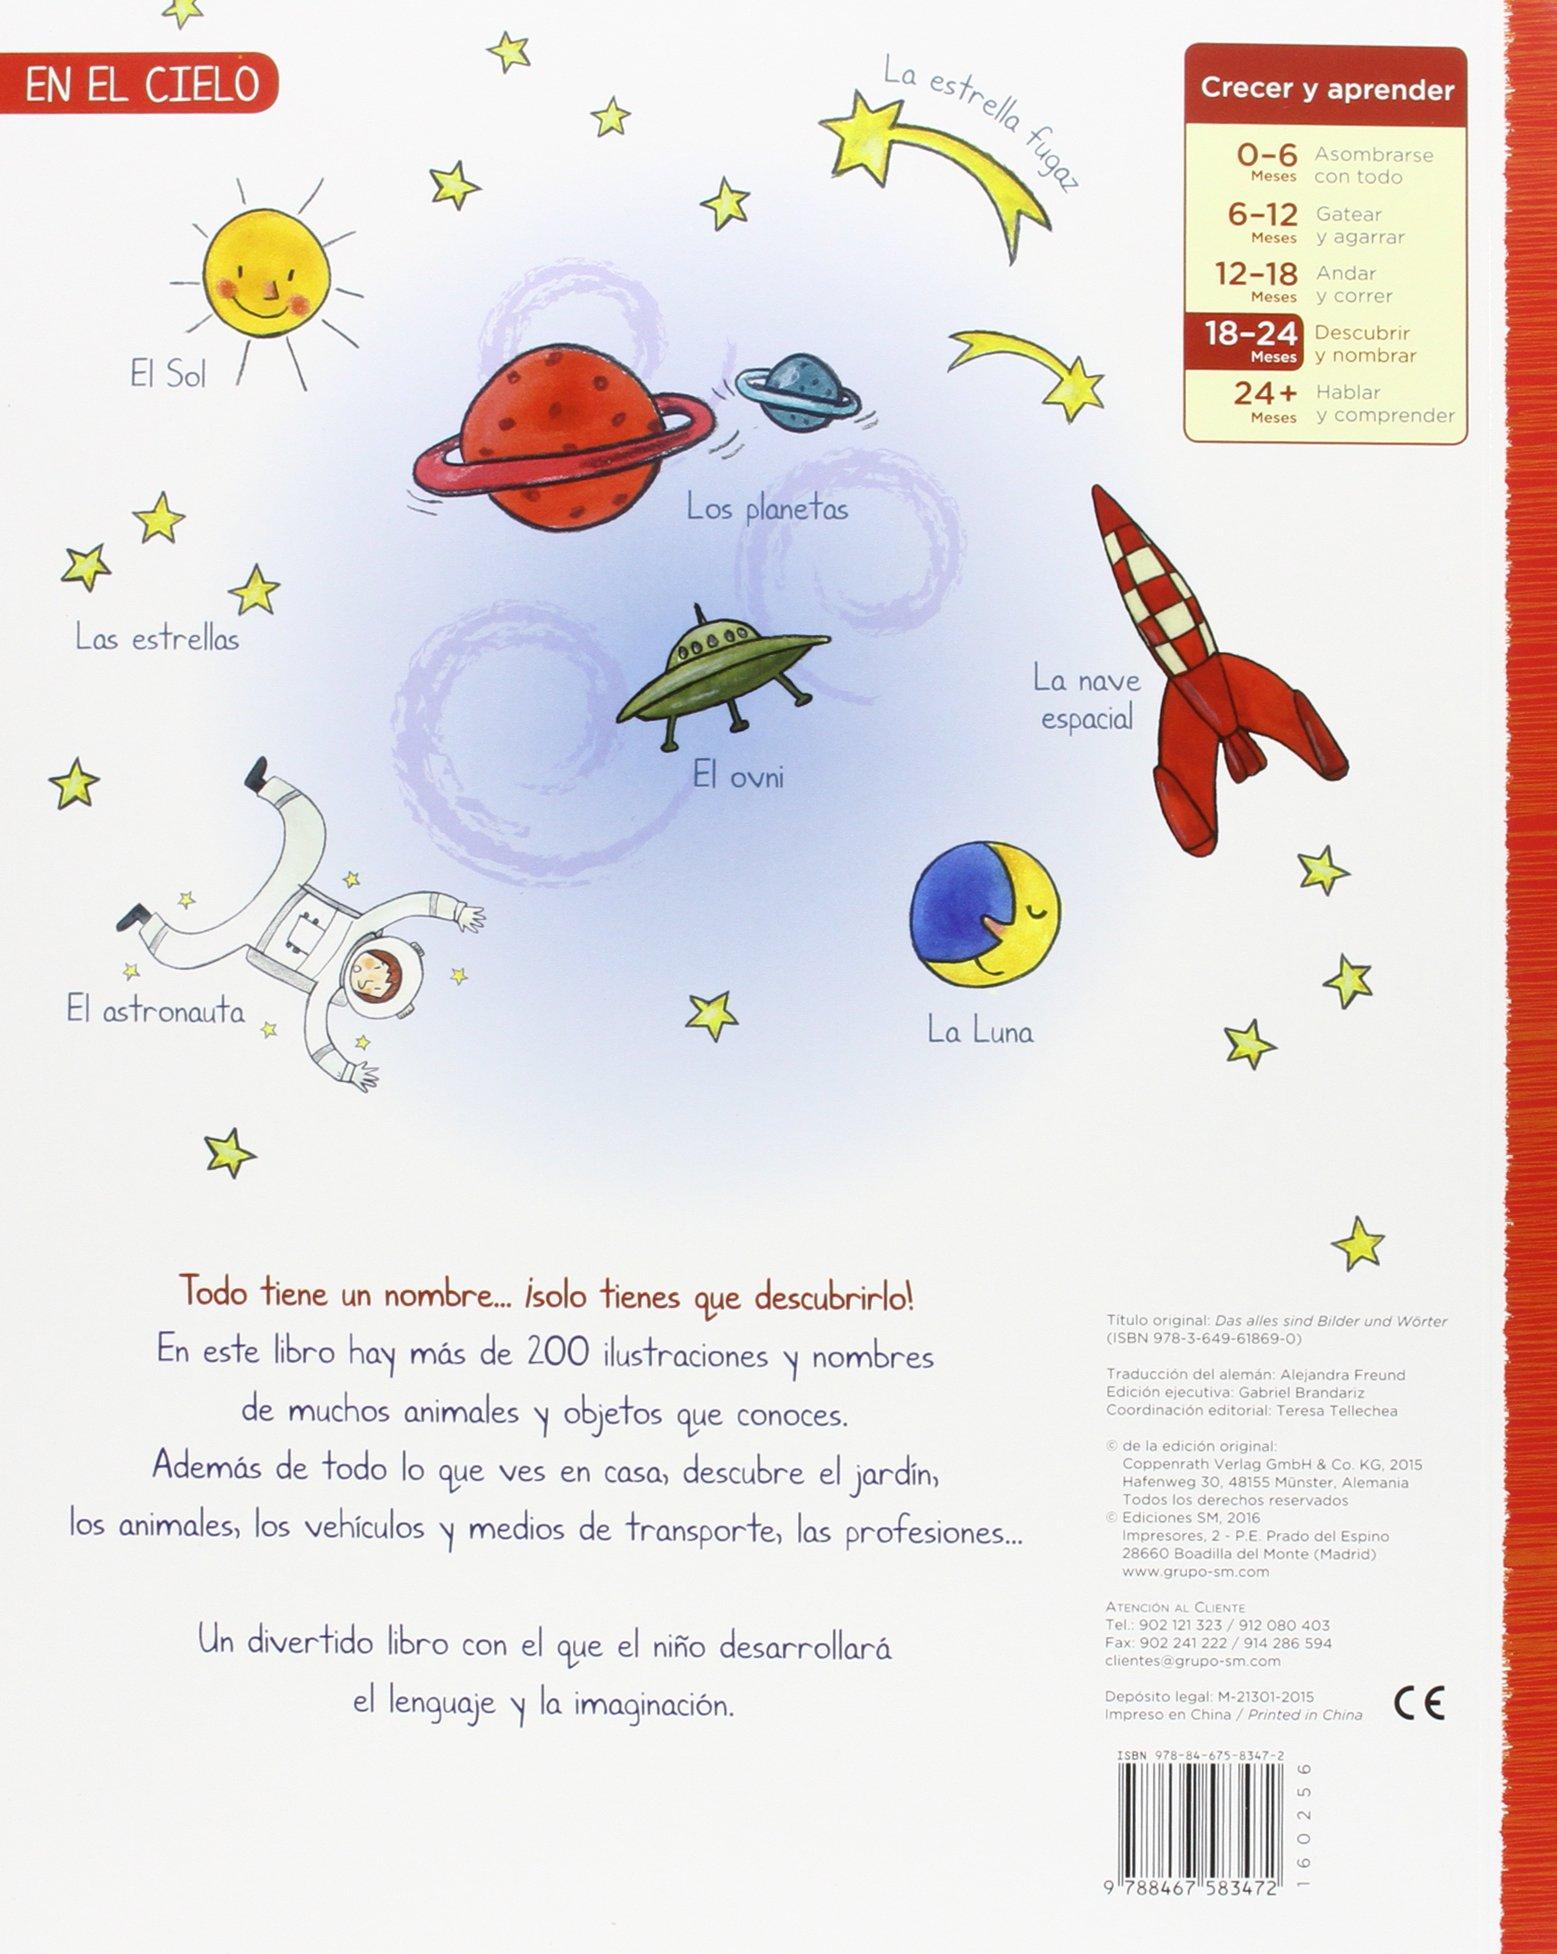 Mi gran imaginario (Libros de cartón): Amazon.es: Kawamura, Yayo, Kawamura, Yayo, Freund Urrutia, Alejandra: Libros